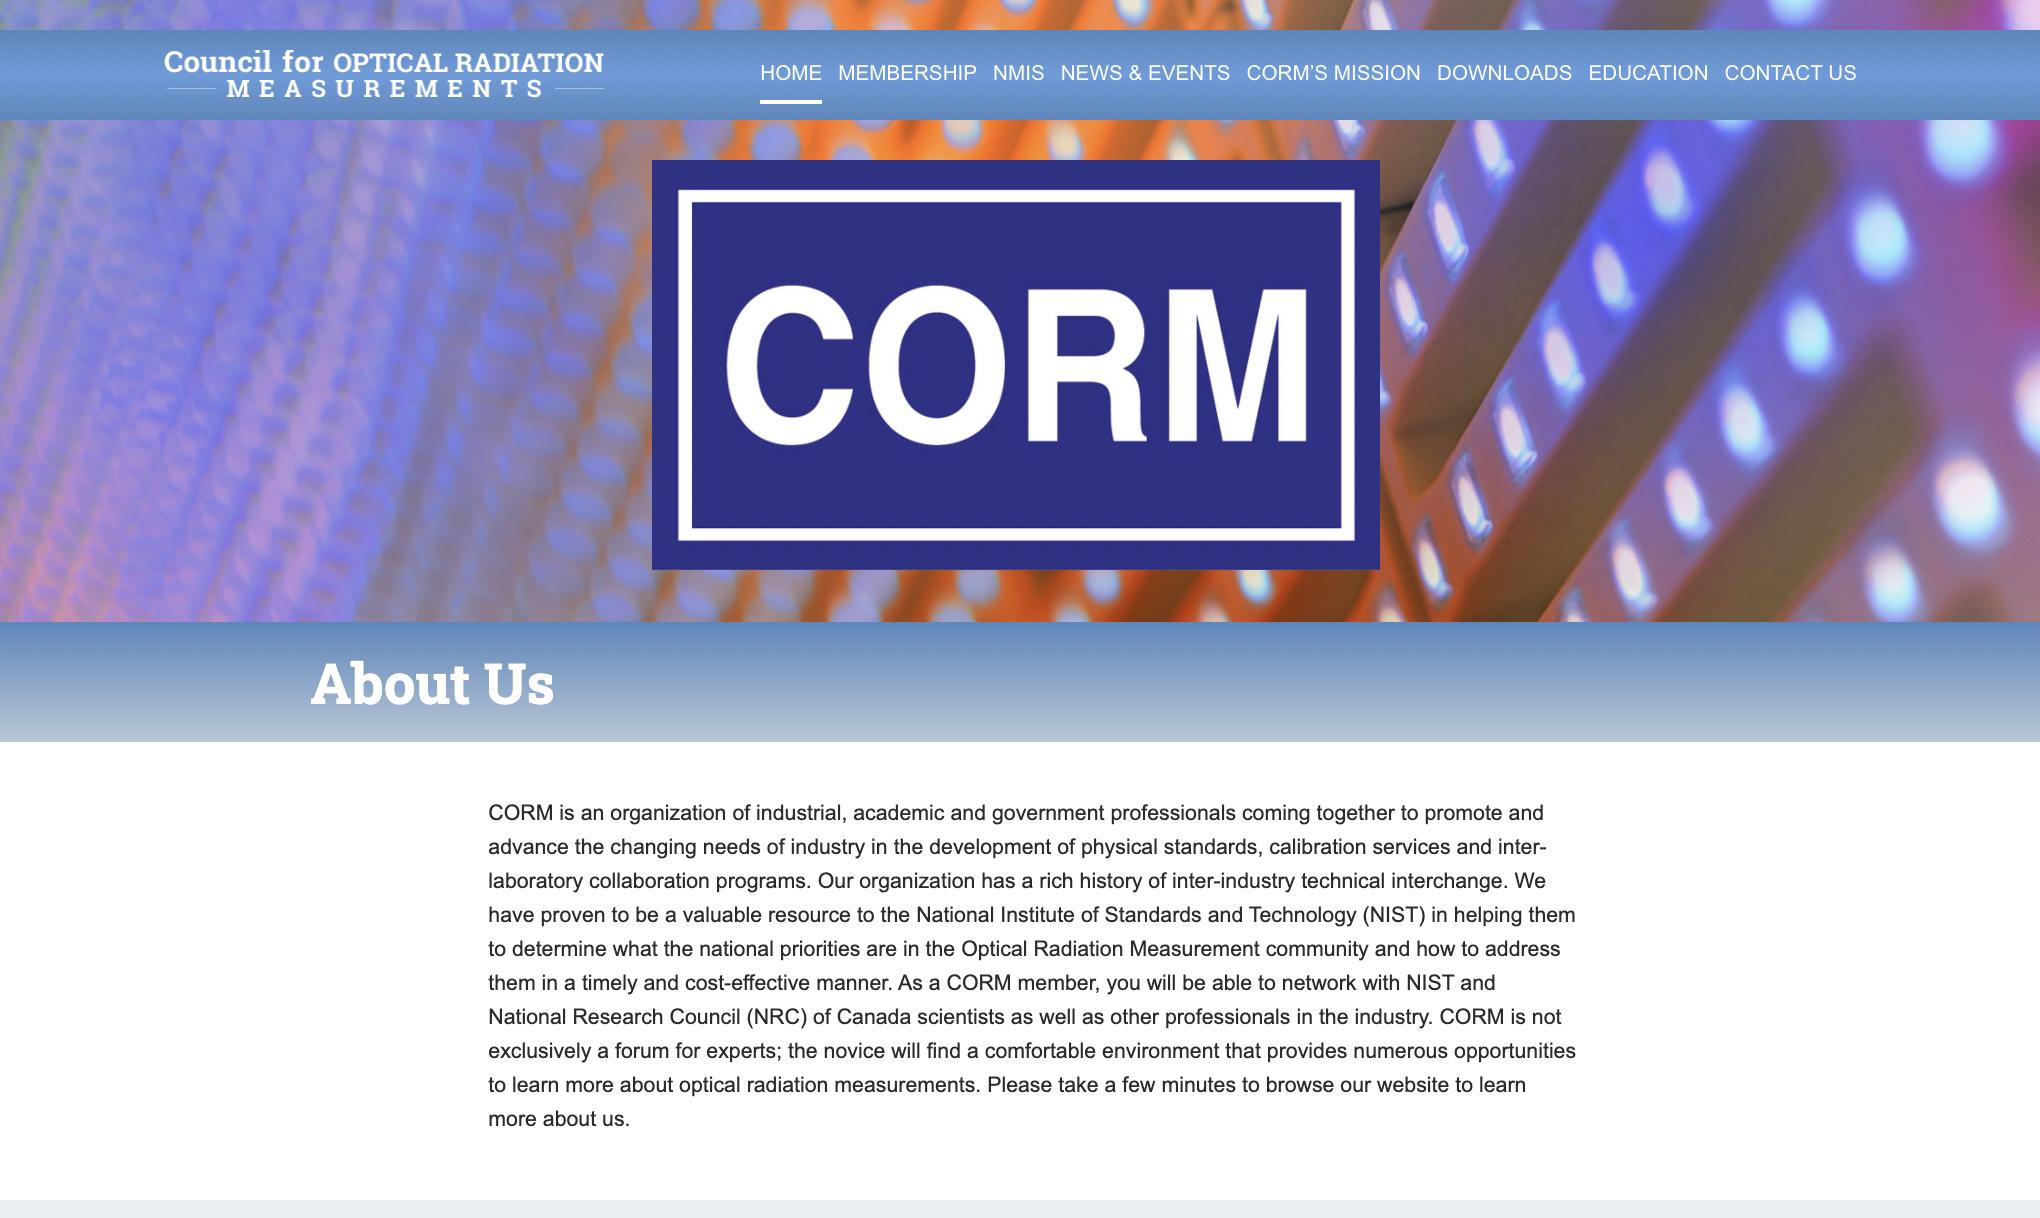 CORM Home Page